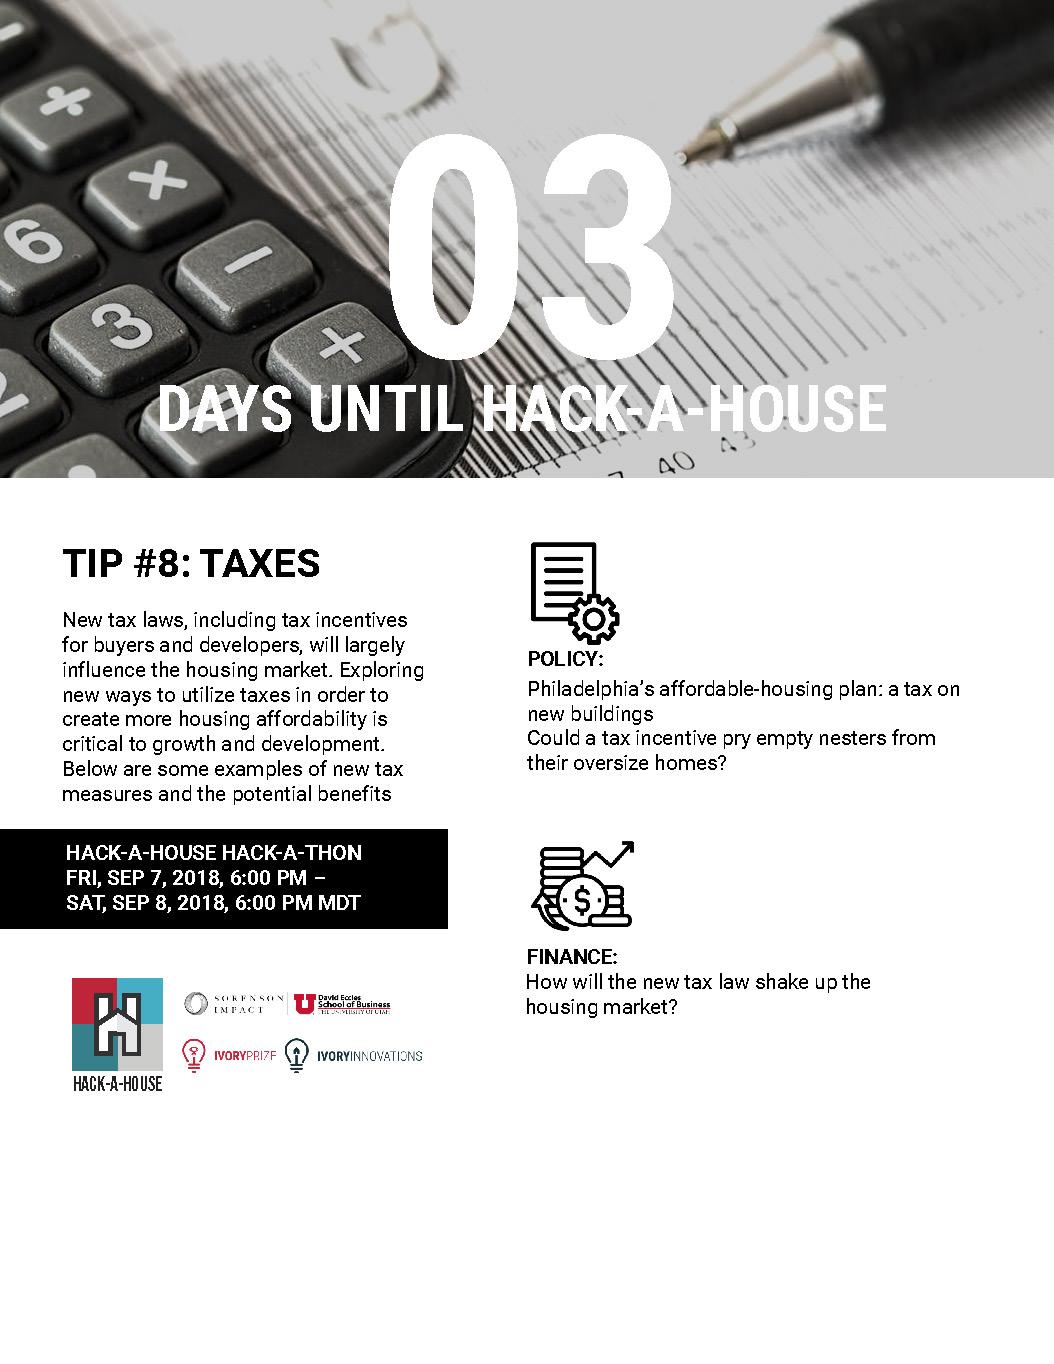 hack-a-house countdown_08.jpg